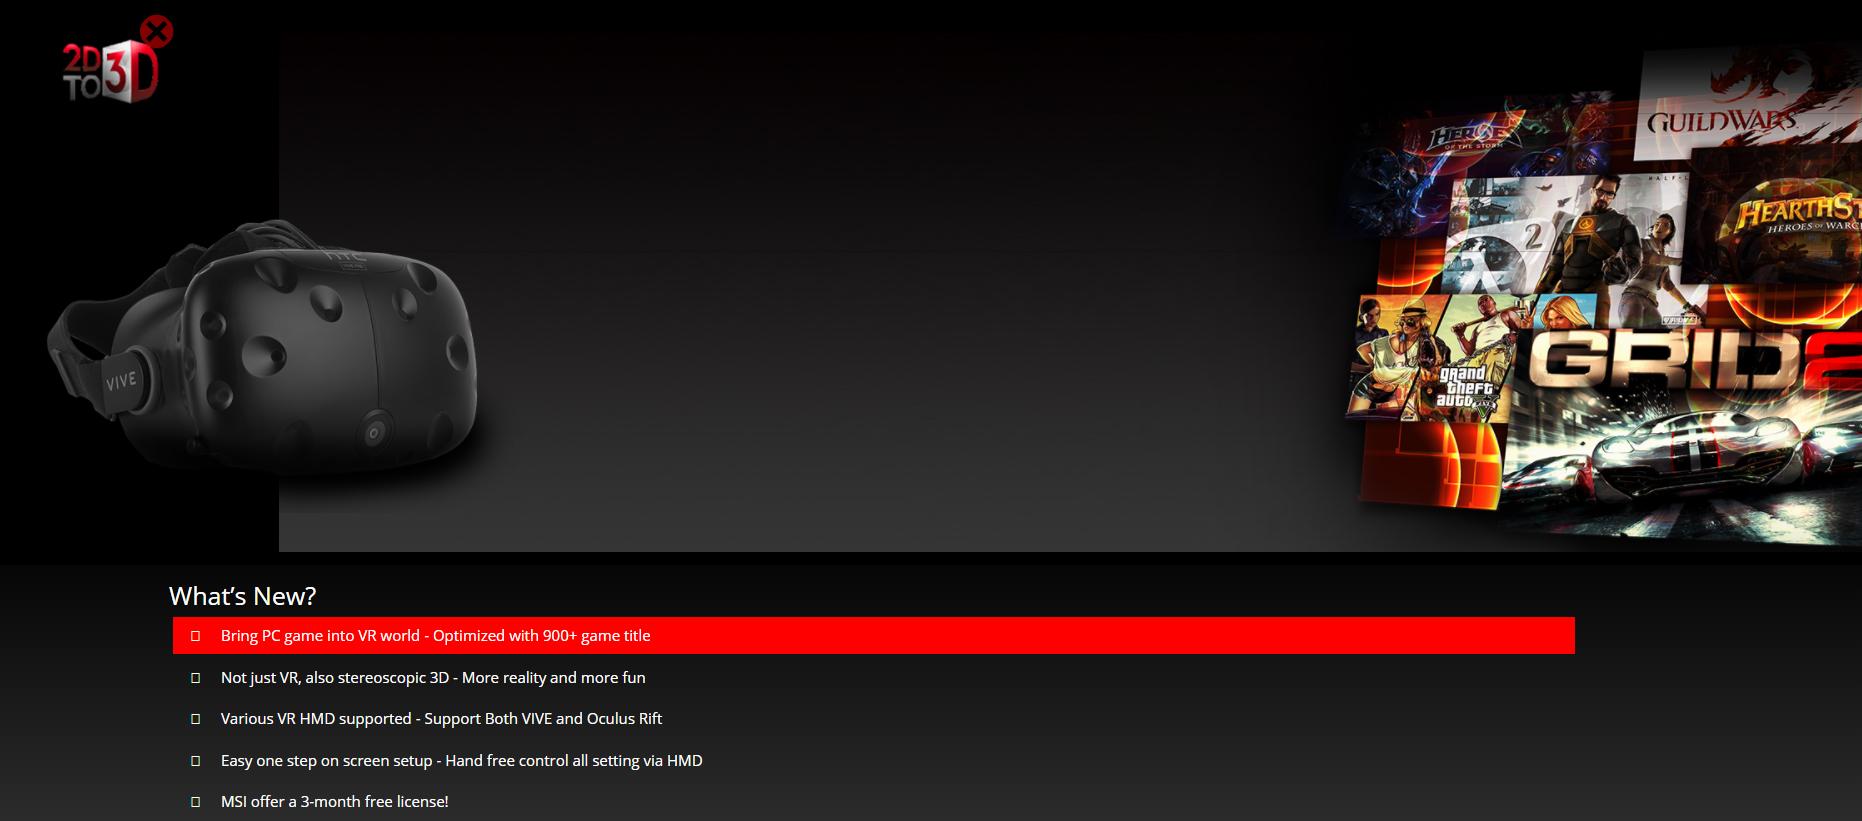 msi aegis ti3 8rg 012us mystic light rgb led gaming desktop w